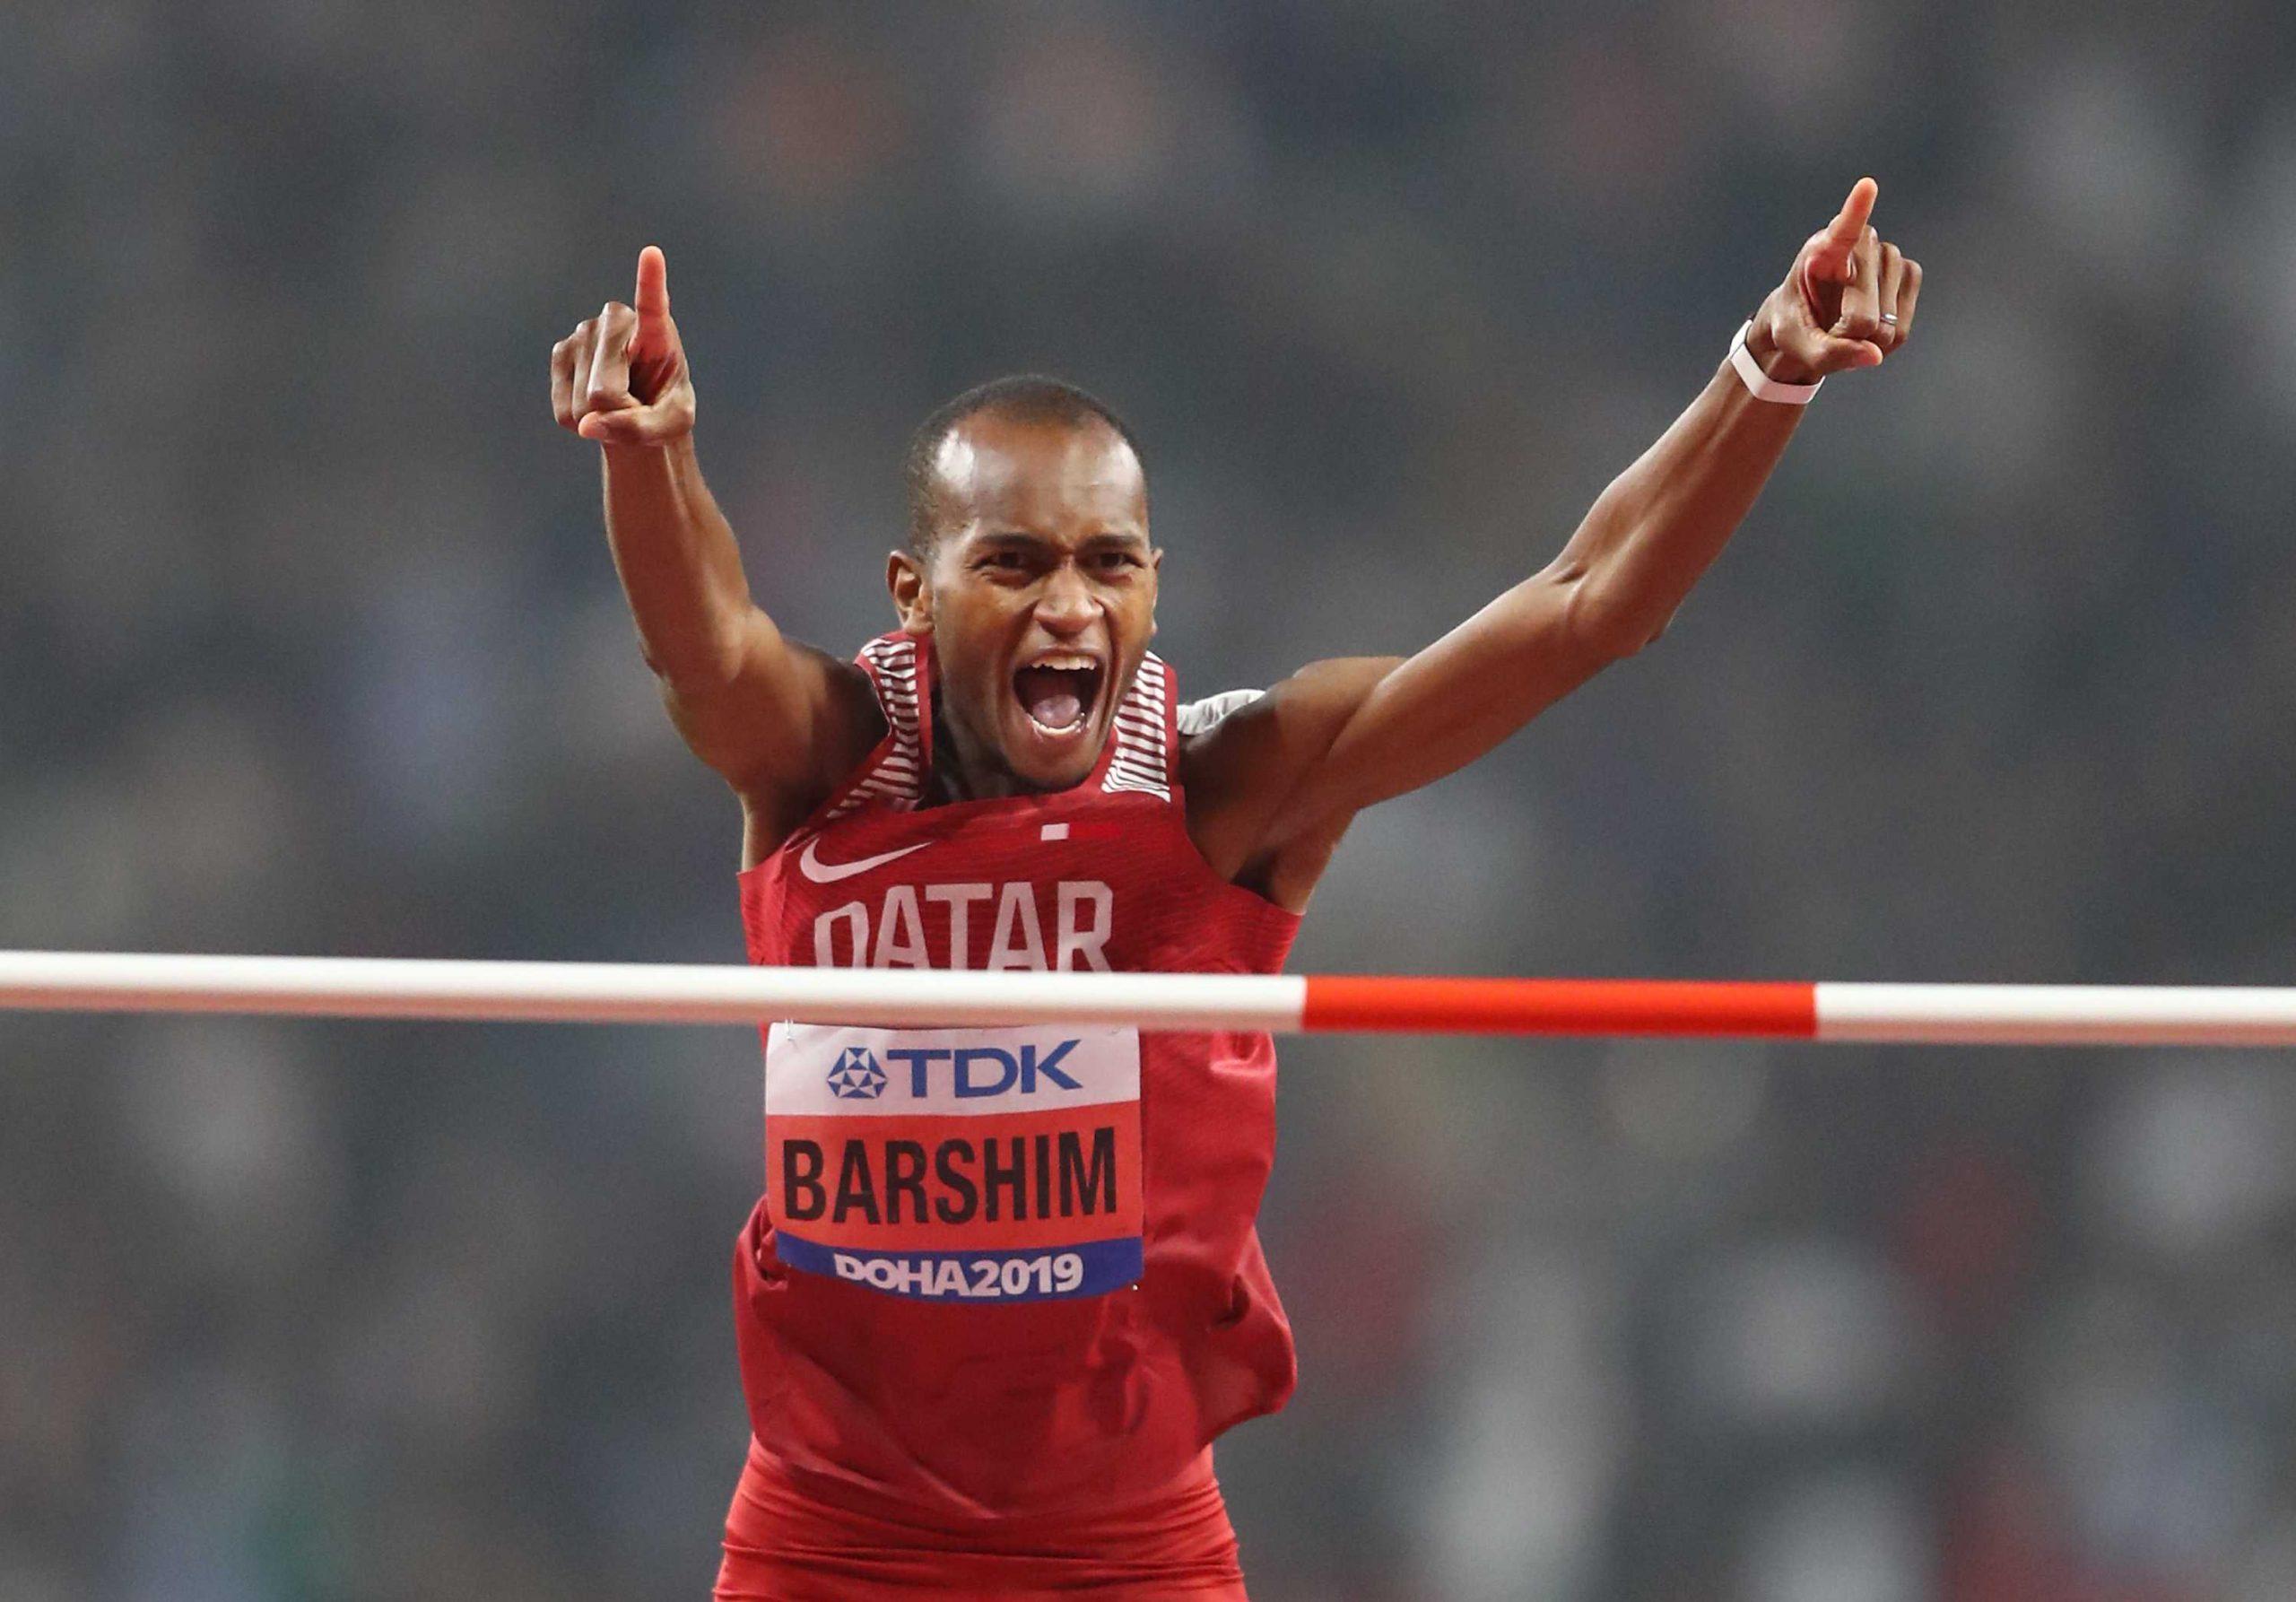 Tokyo Olympics: Mutaz Barshim Eyes Gold in High Jump Final Today